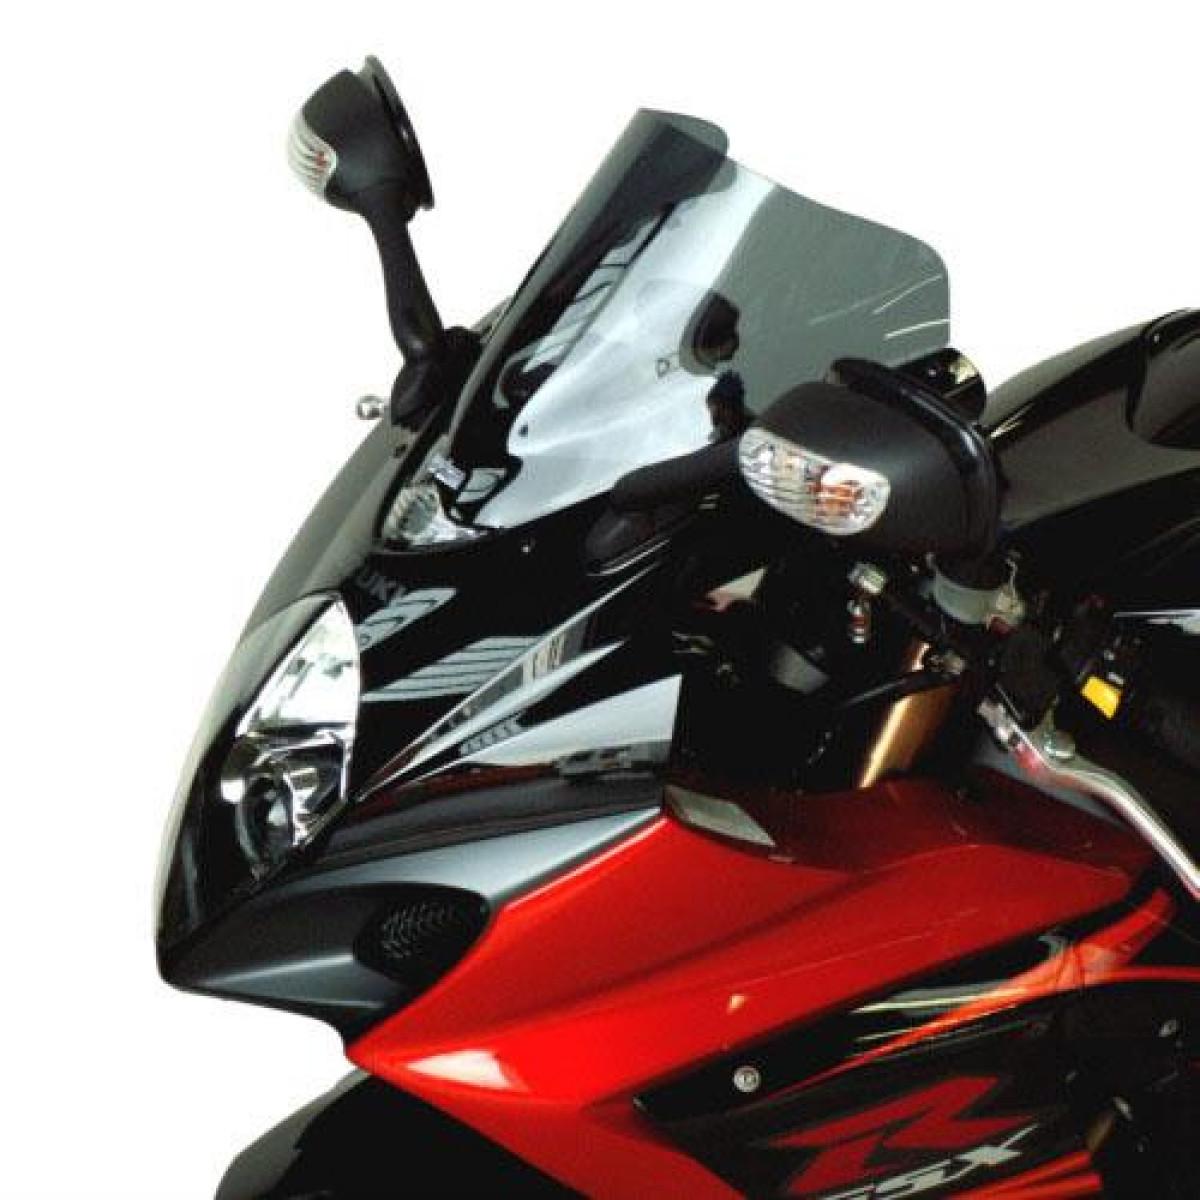 Plexi na motocykl BULLSTER pro SUZUKI GSX R 1000 2007-2008 výška 440 ... ac794fee73